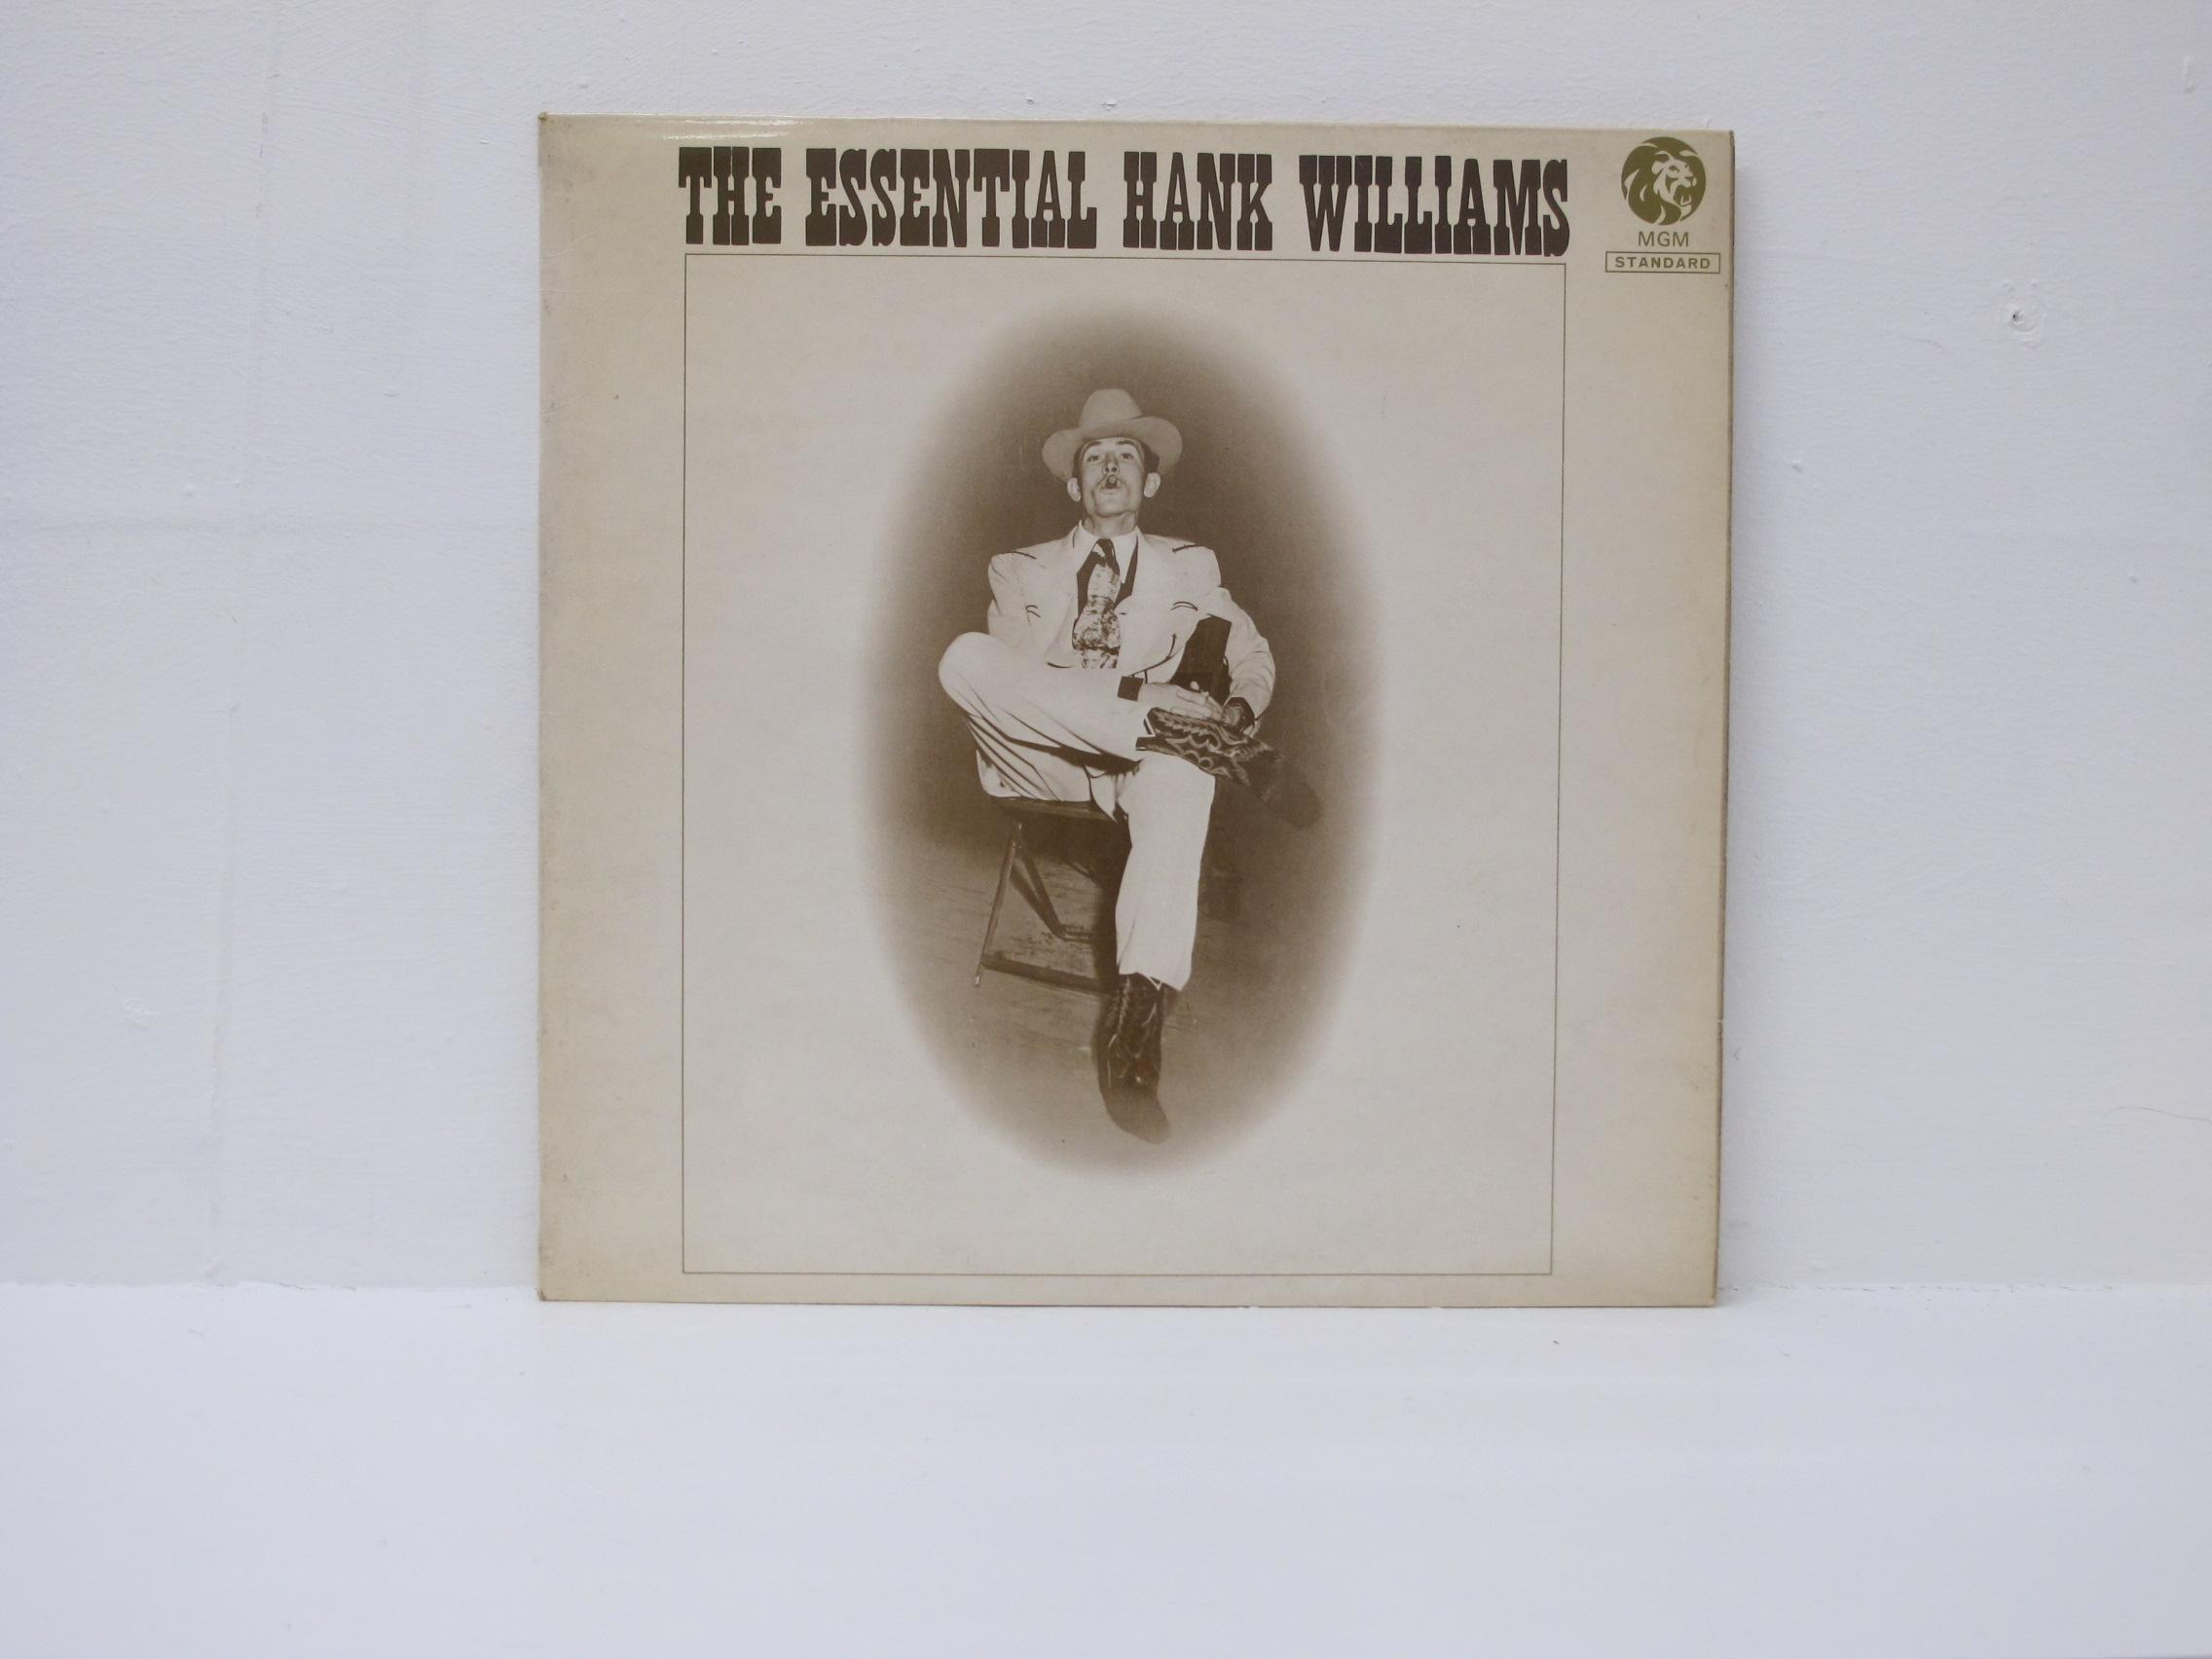 Hank Williams - The Essential